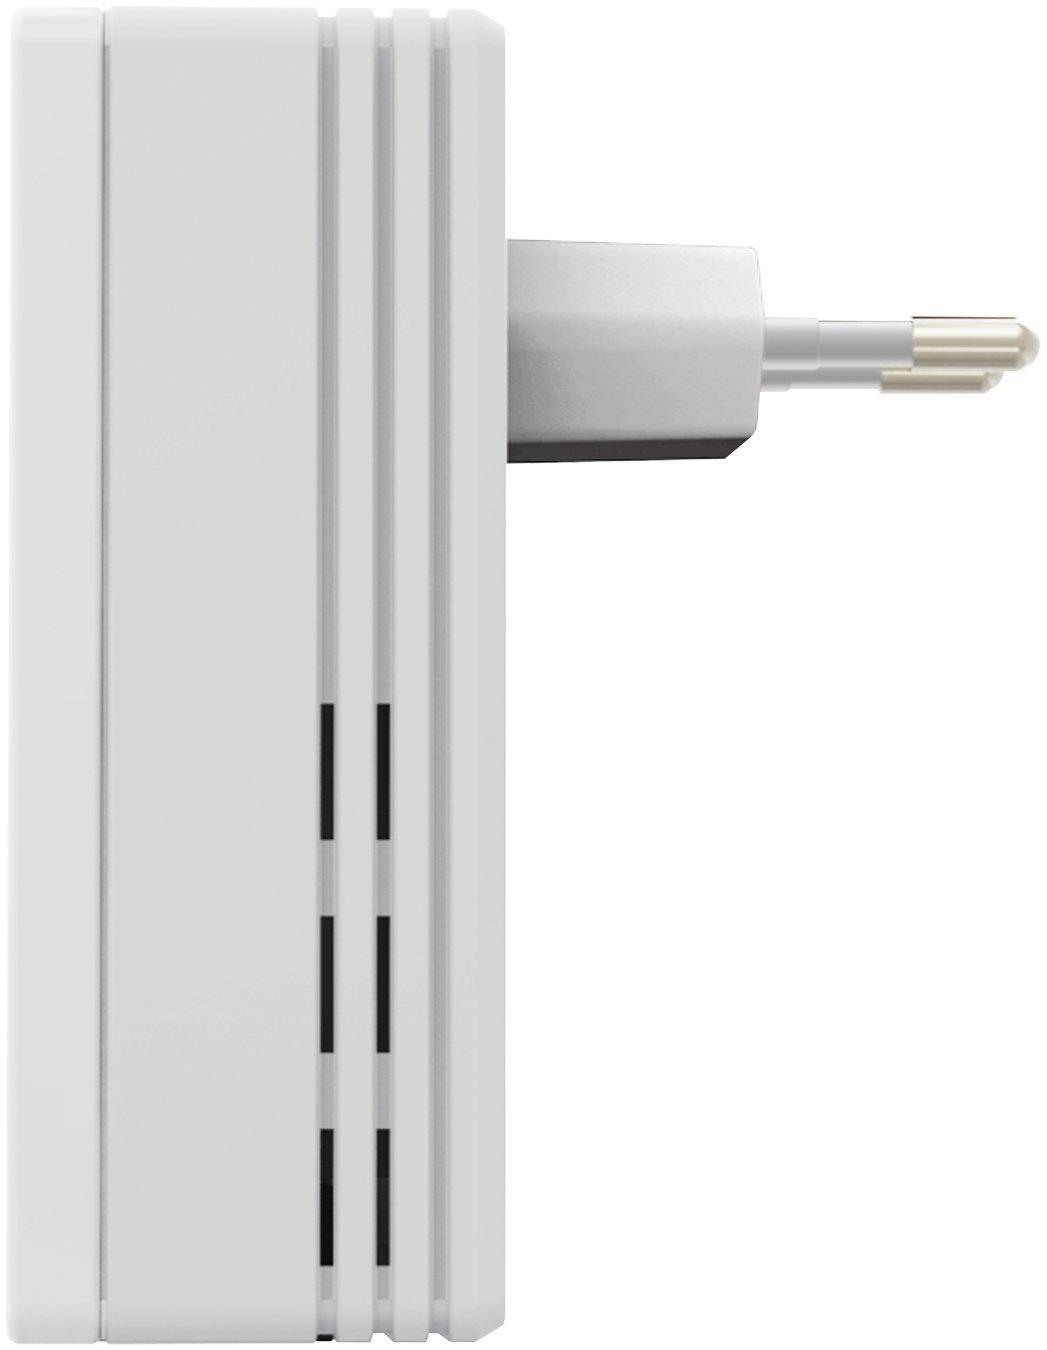 NETGEAR Powerline 200Mbps Mini Adapter - Starter Kit (XAVB1301) by NETGEAR (Image #6)